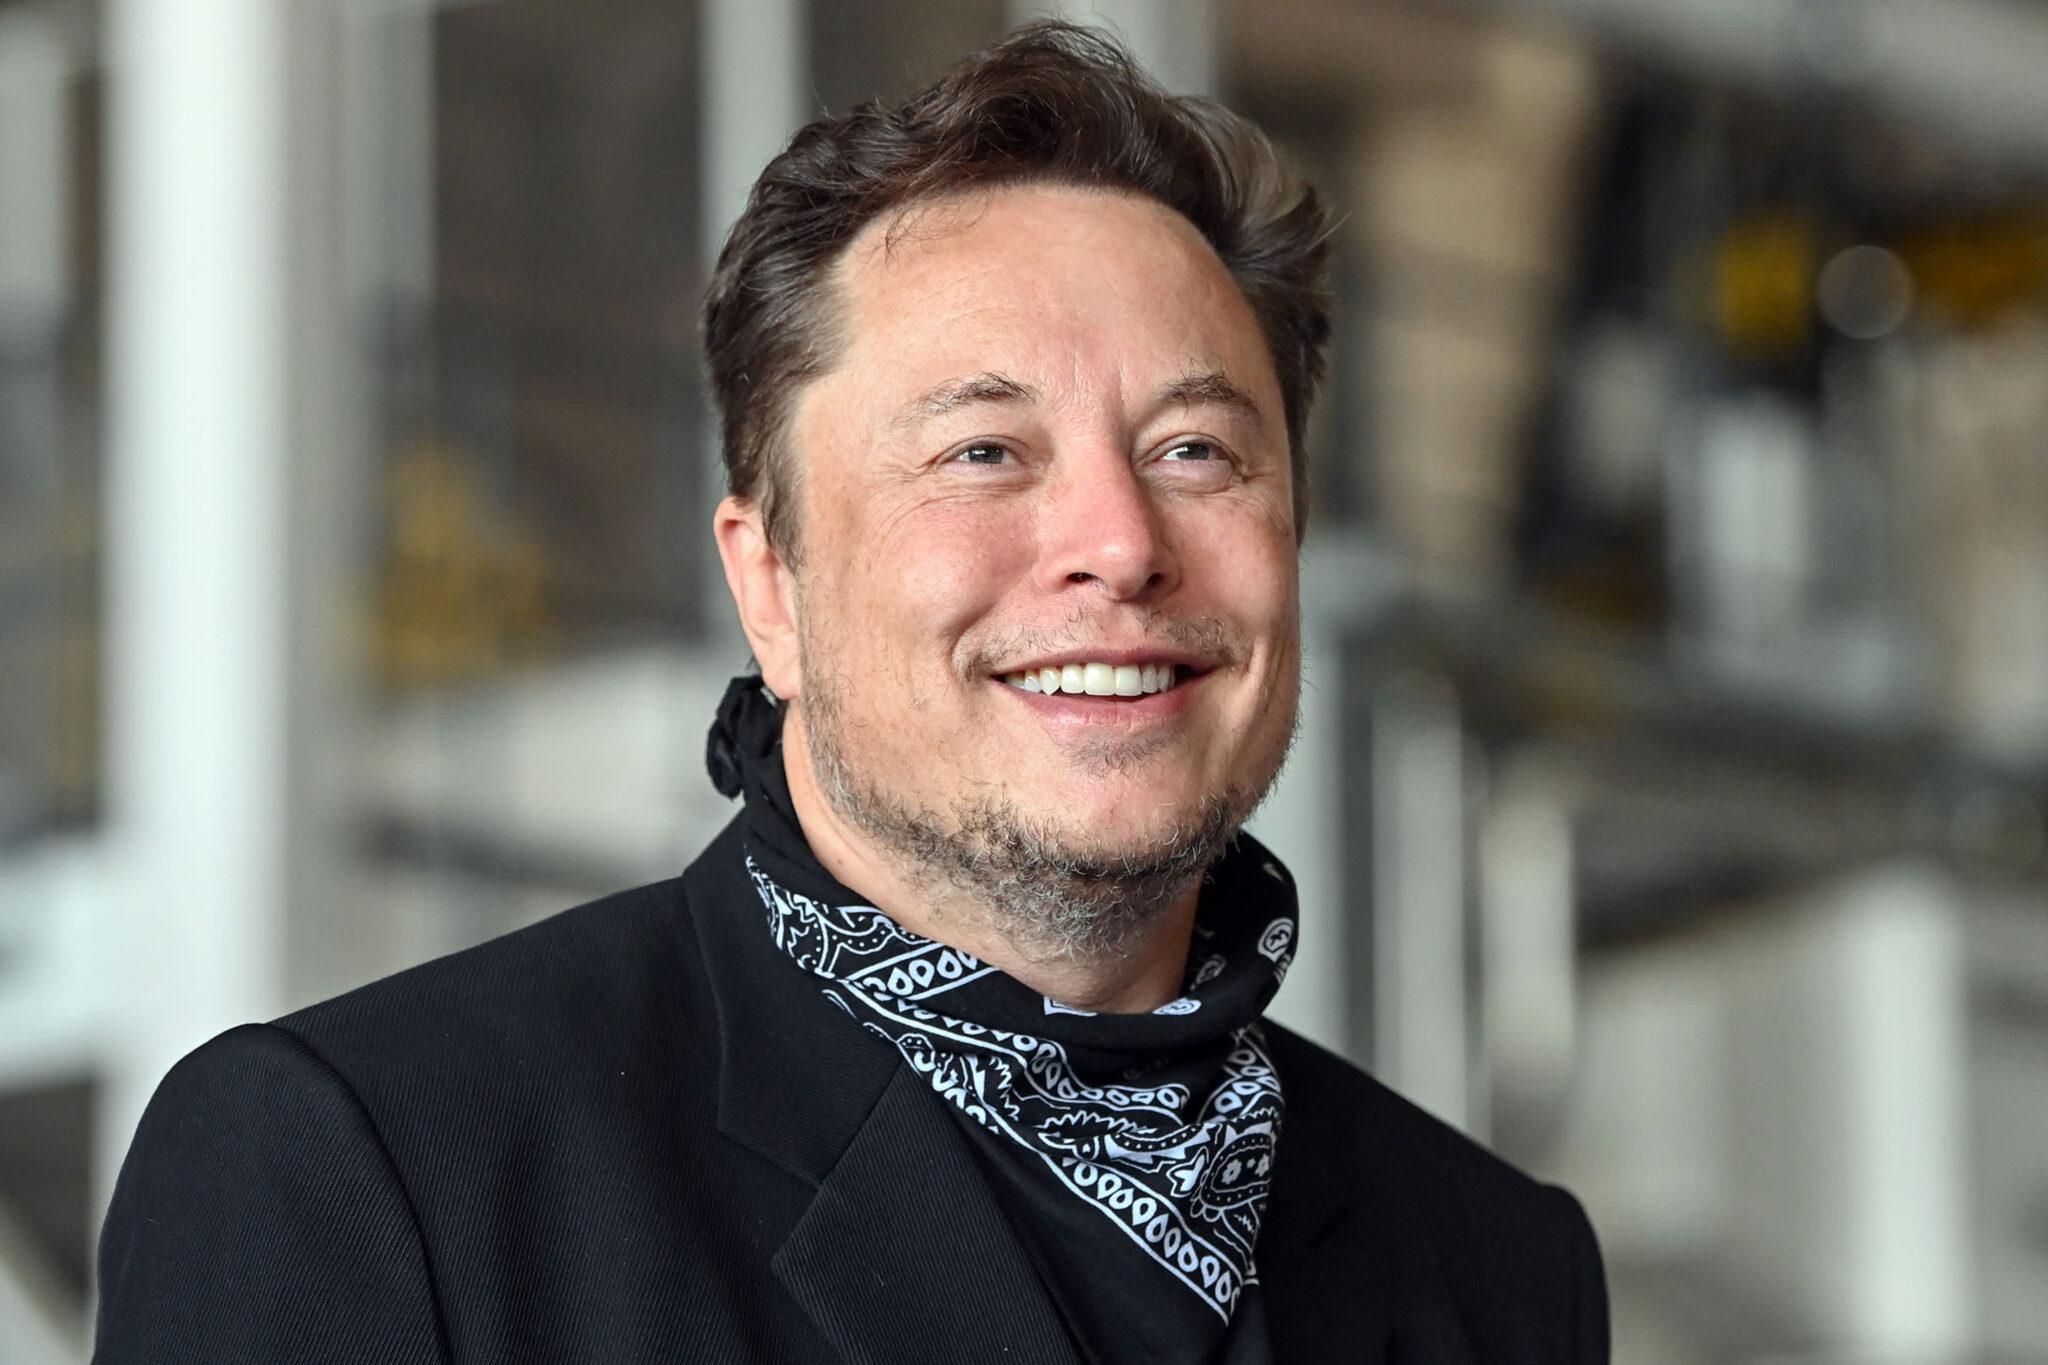 Elon Musk krytykuje regulacje